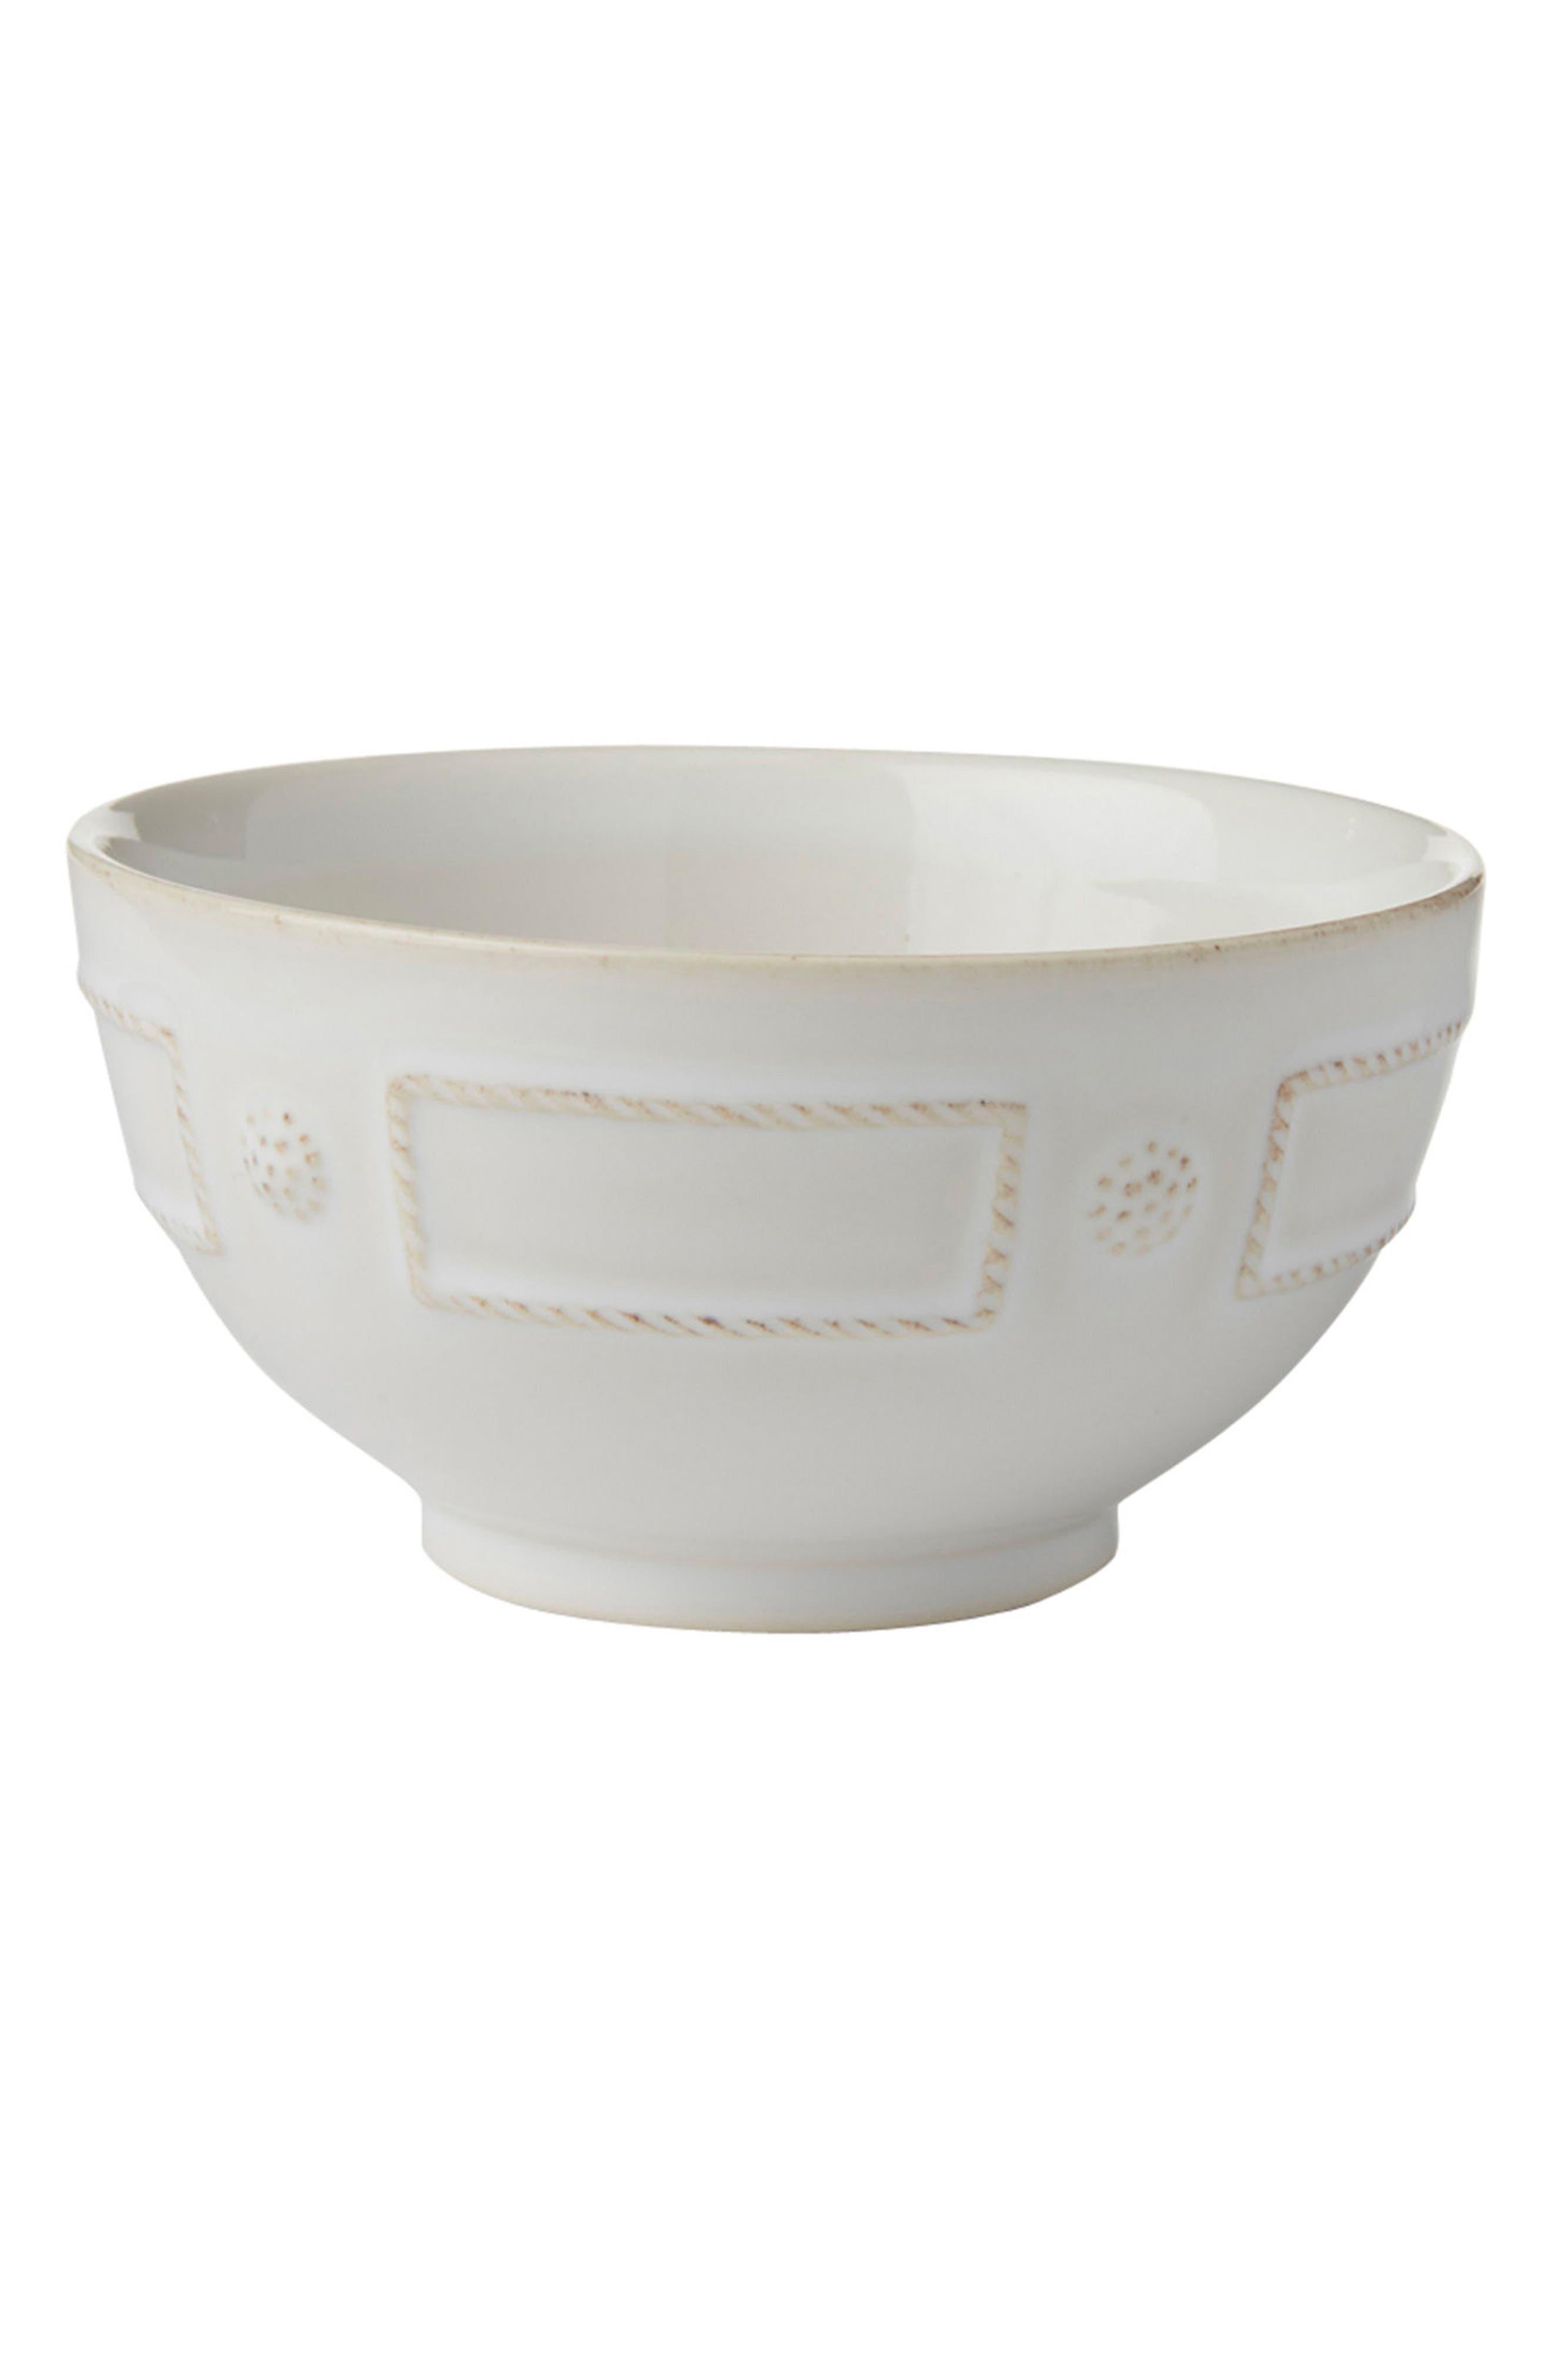 Juliska Berry & Thread French Panel Ceramic Cereal Bowl